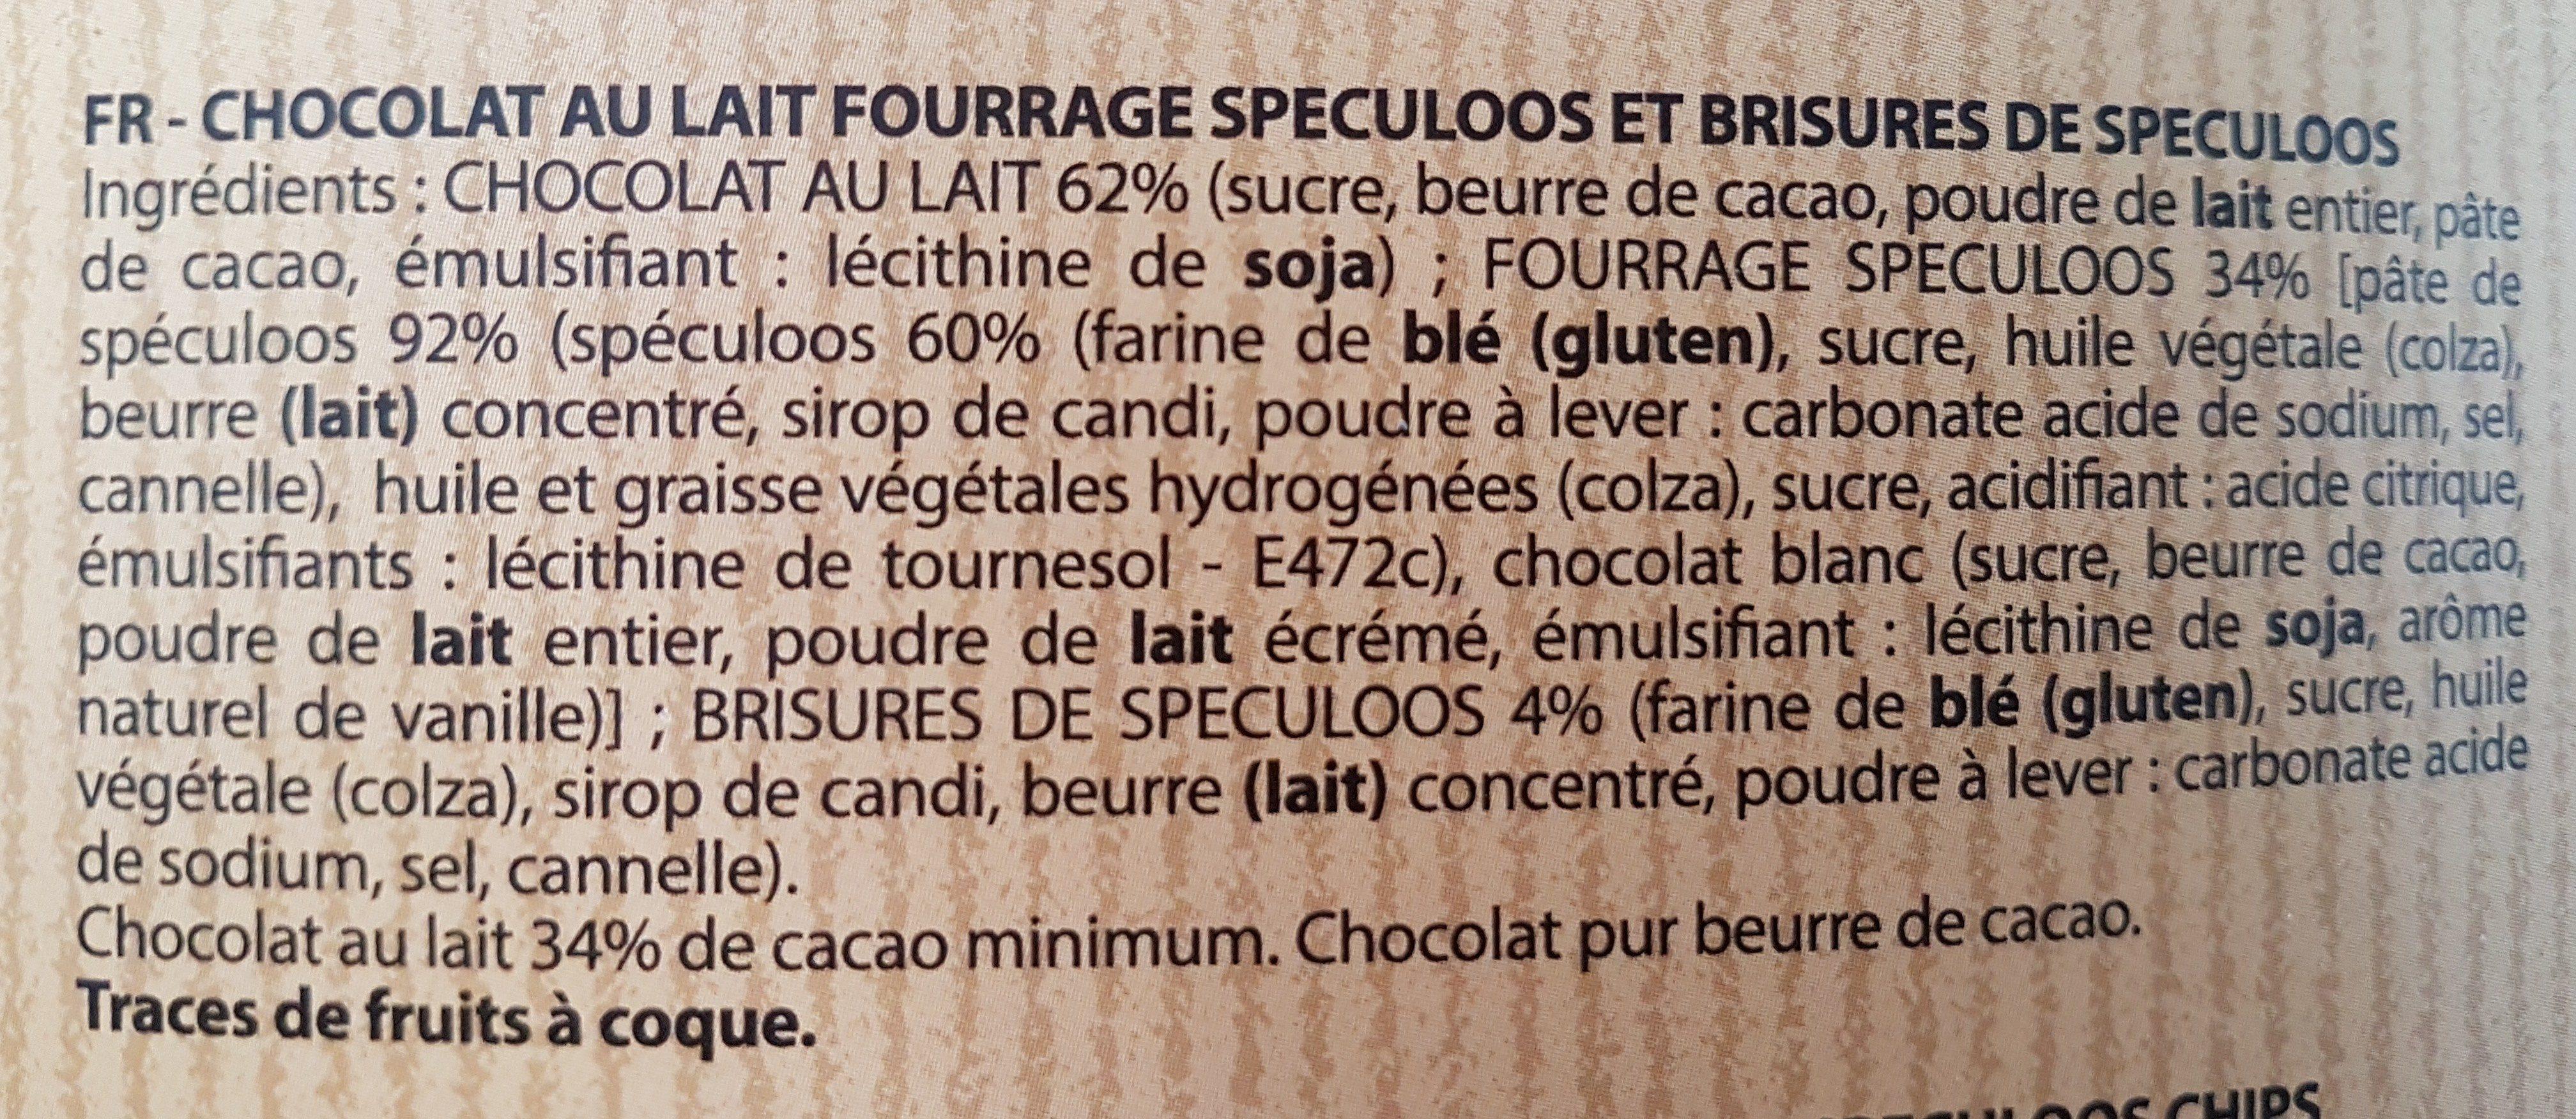 Chocolat au lait fourrage au Speculoos - Ingredients